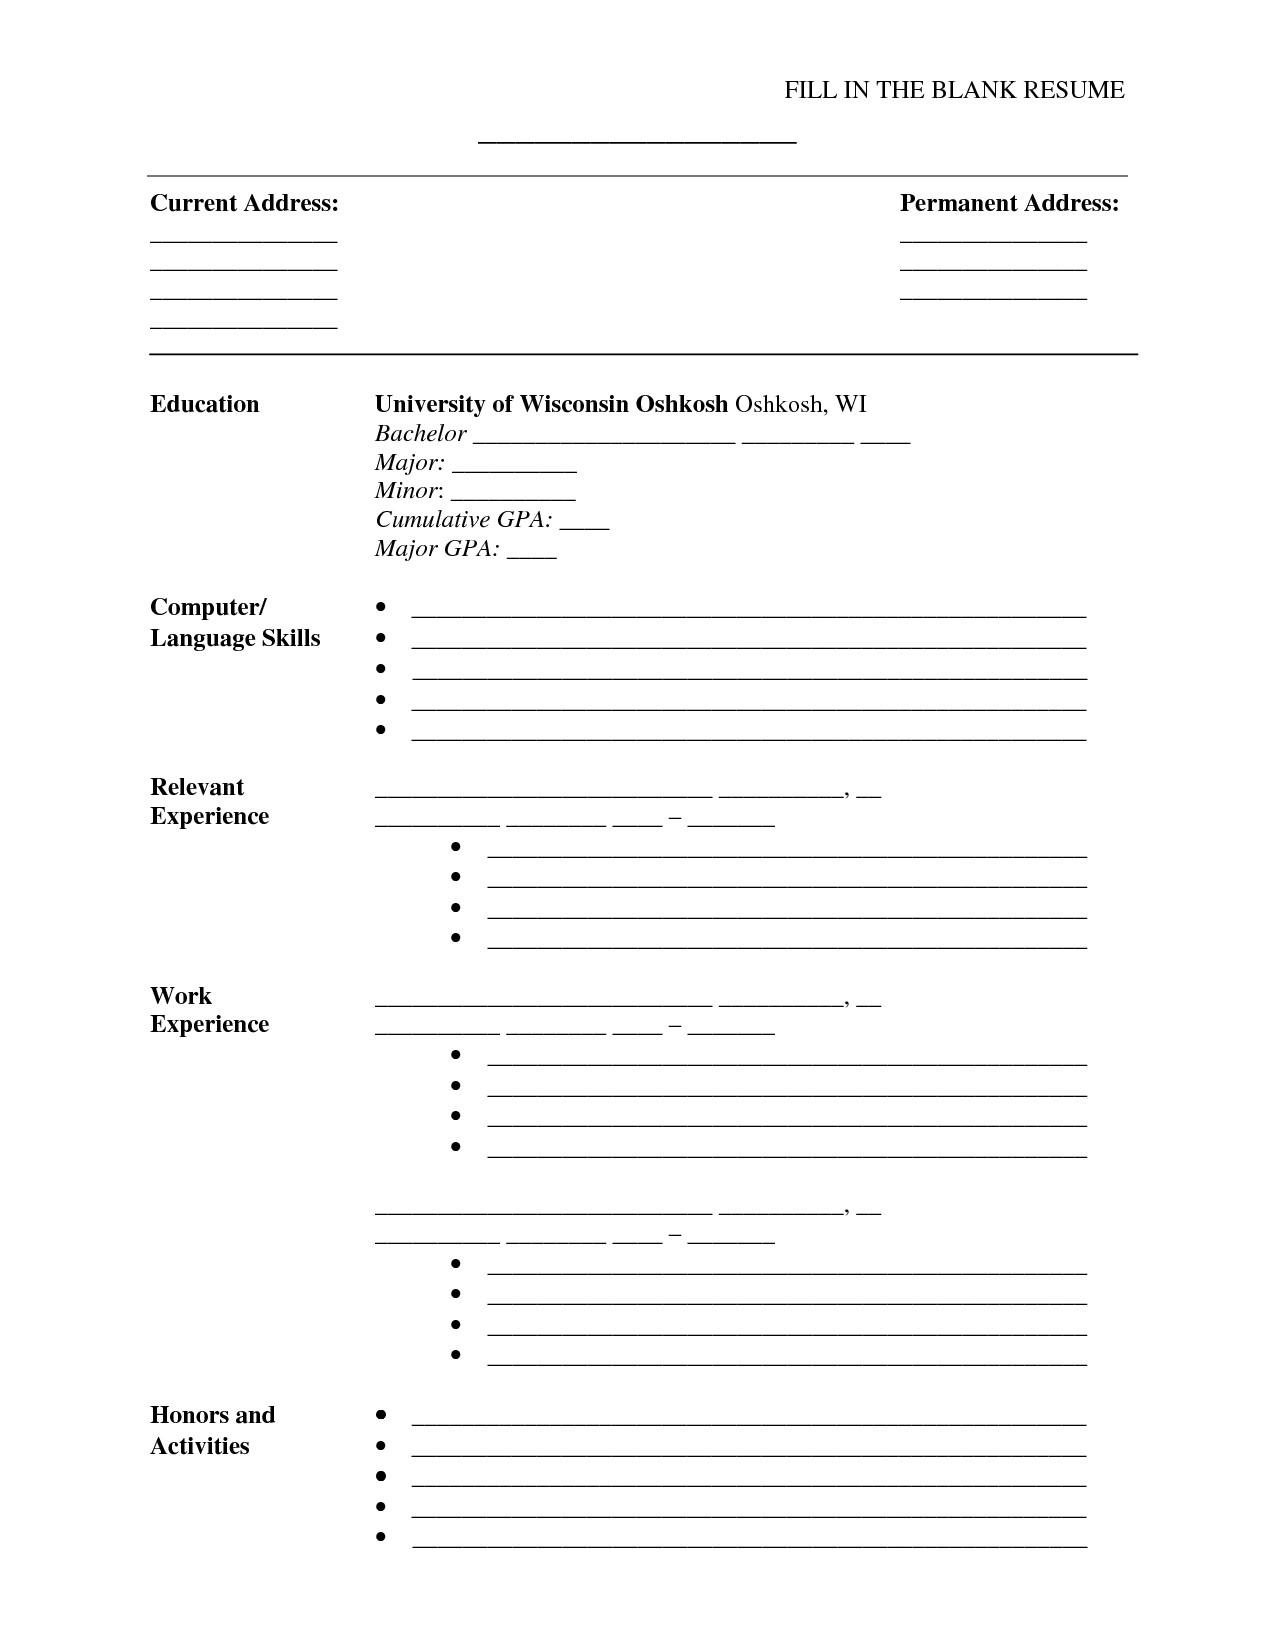 Free Printable Resume Builder Templates - Viaweb.co - Free Printable Resume Builder